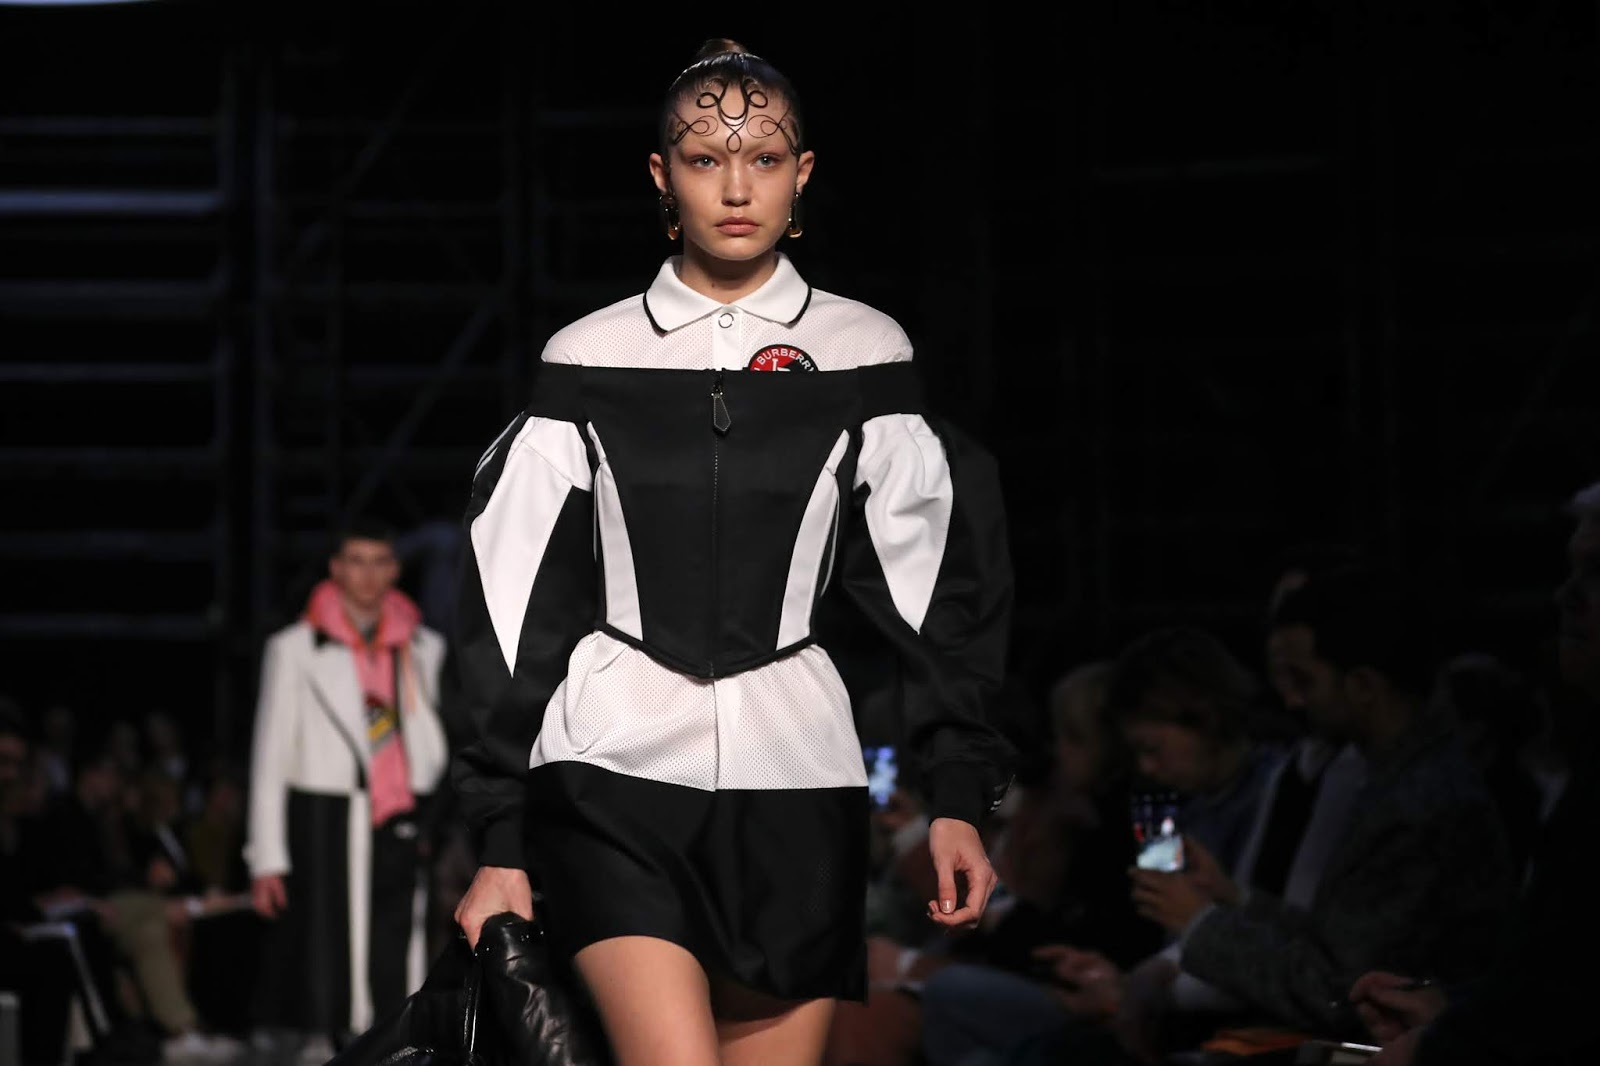 Gigi Hadid - Burberry 2019 A / W collection catwalk show at London Fashion Week - 02/17/2019